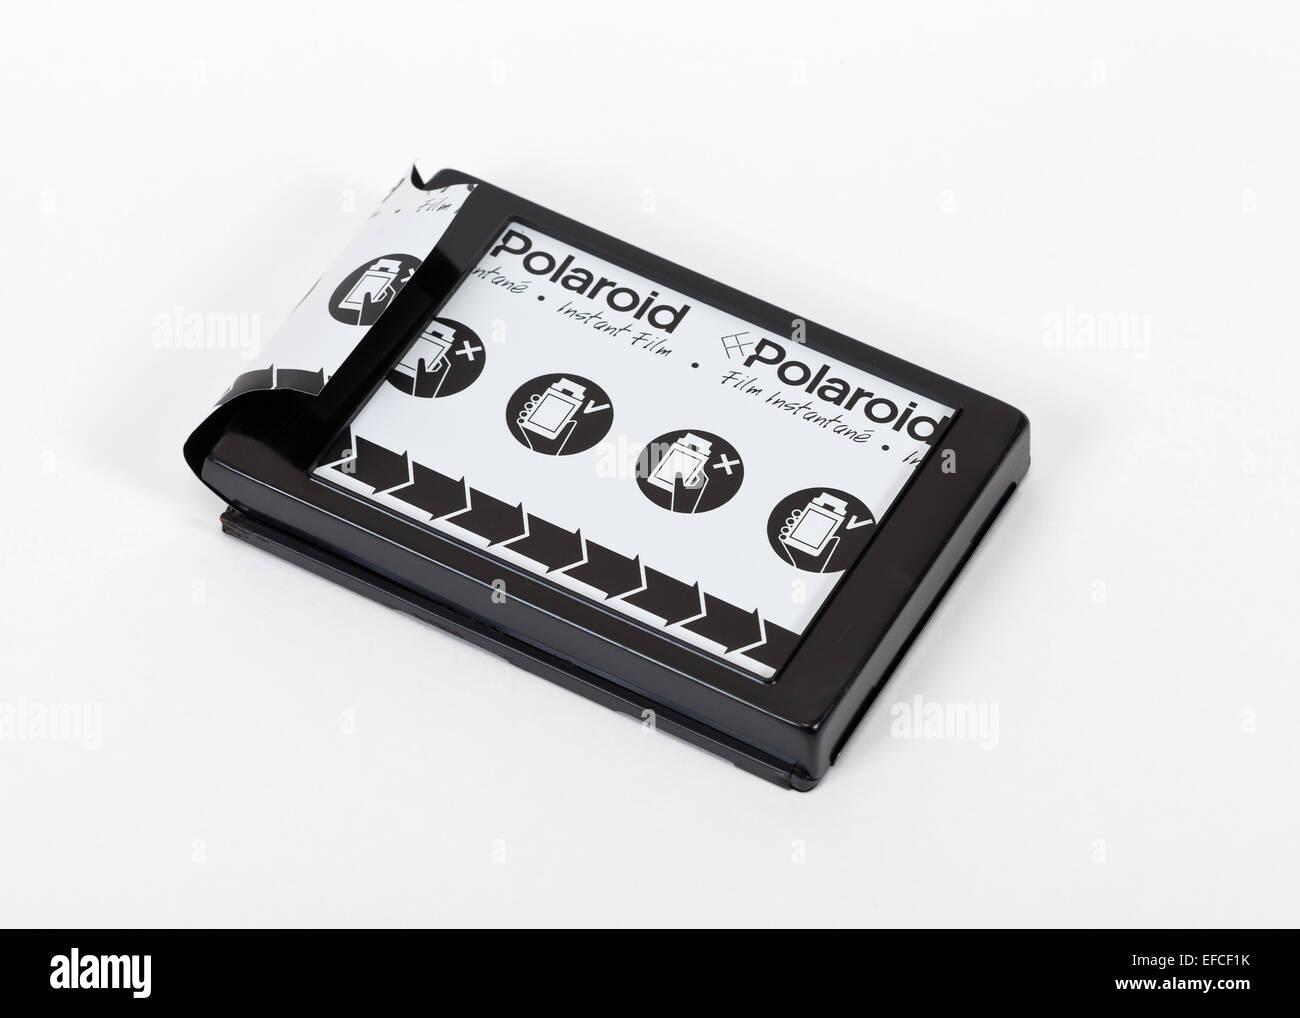 Cassette for instant camera Polaroid over white background - Stock Image